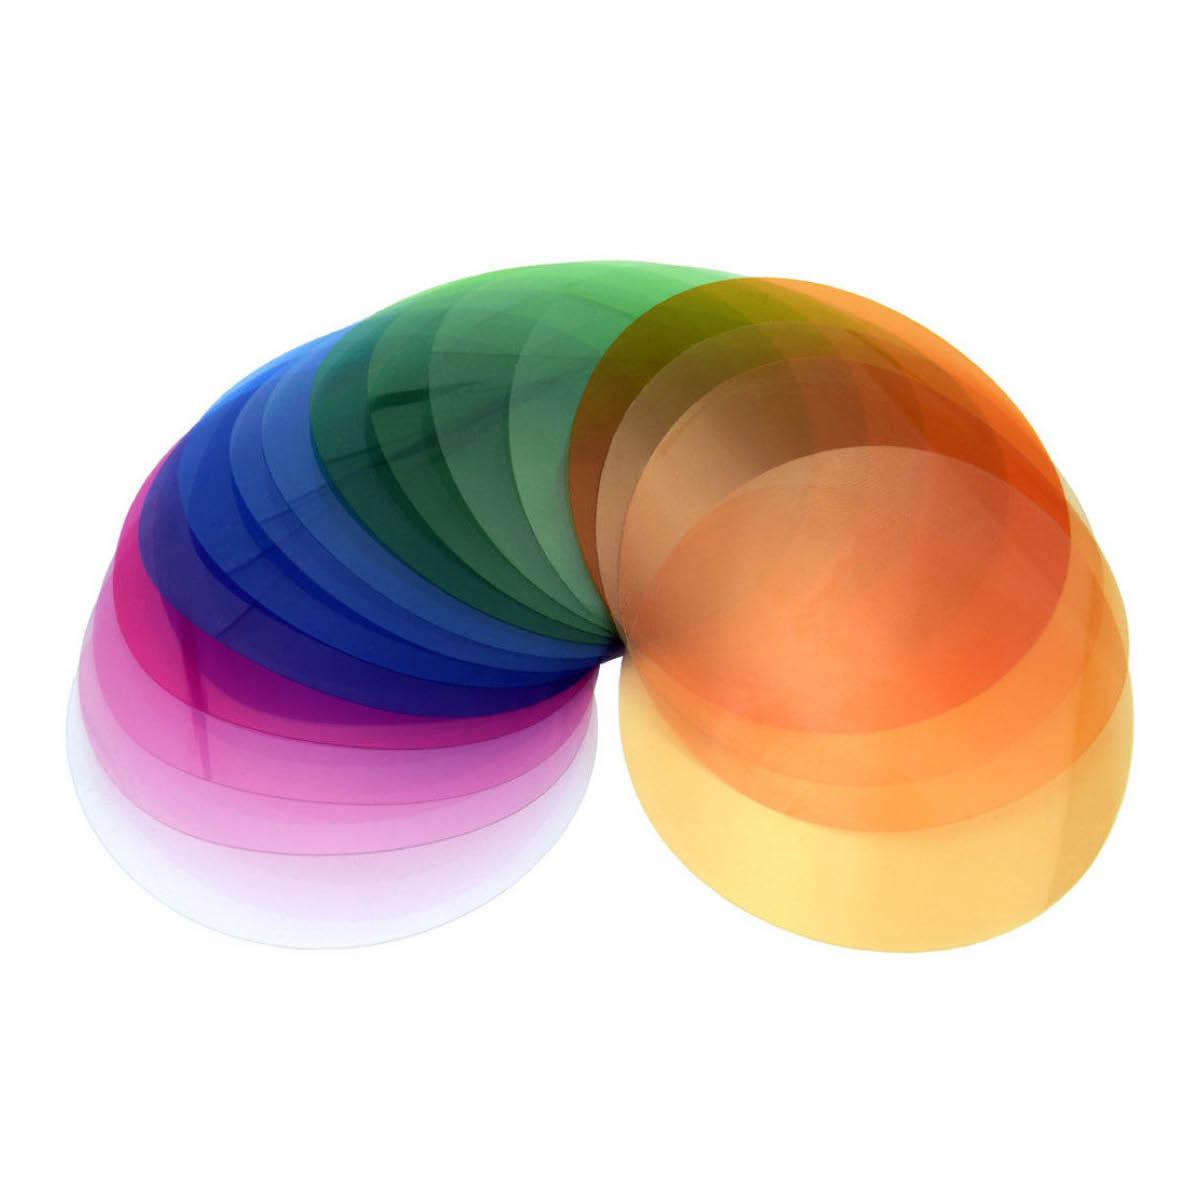 Godox Farbtemperatur Einstellset V 11T